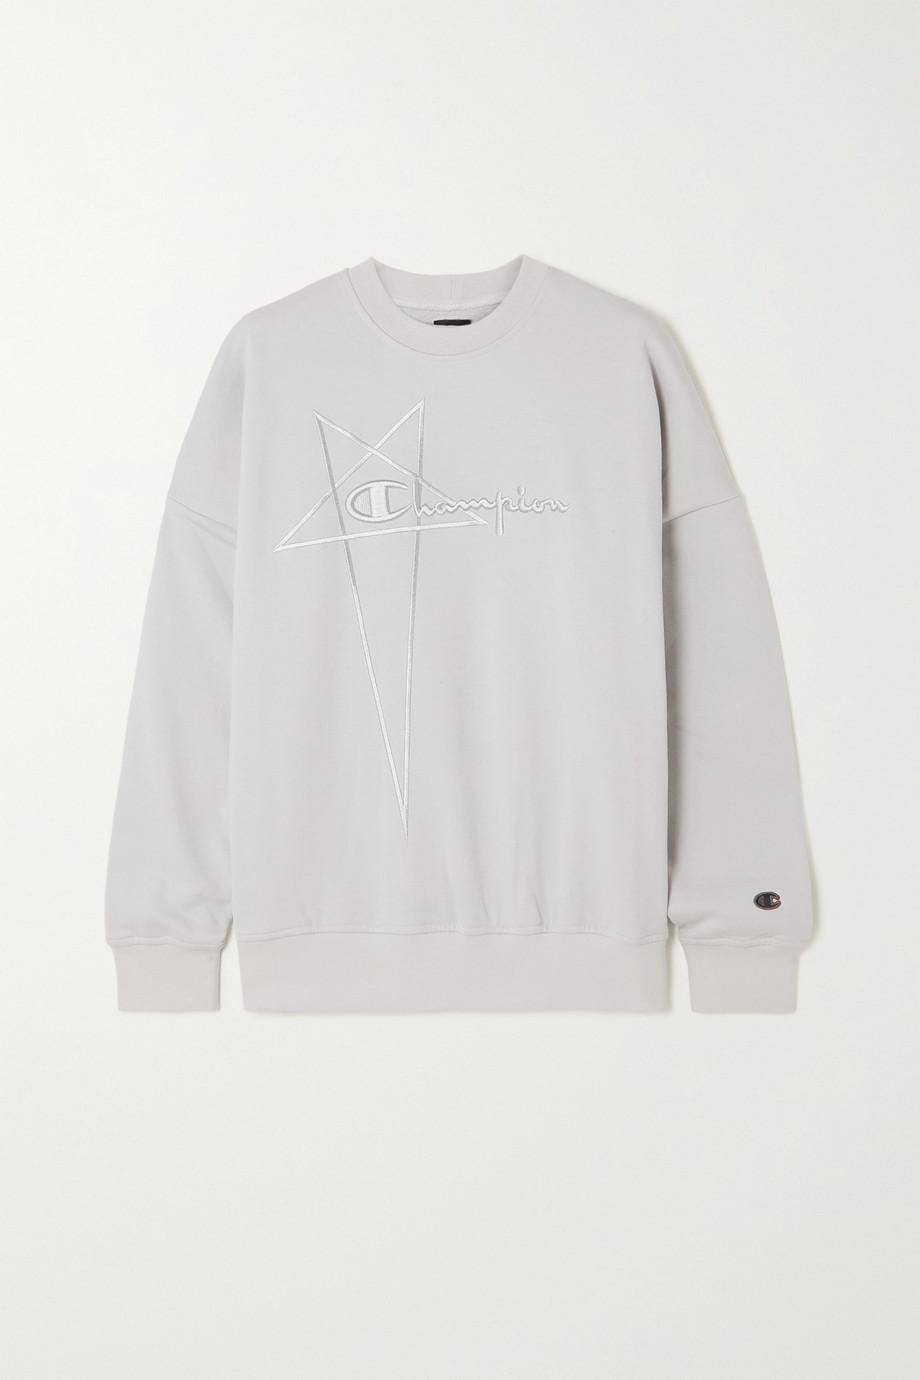 Rick Owens + Champion embroidered organic cotton-jersey sweatshirt